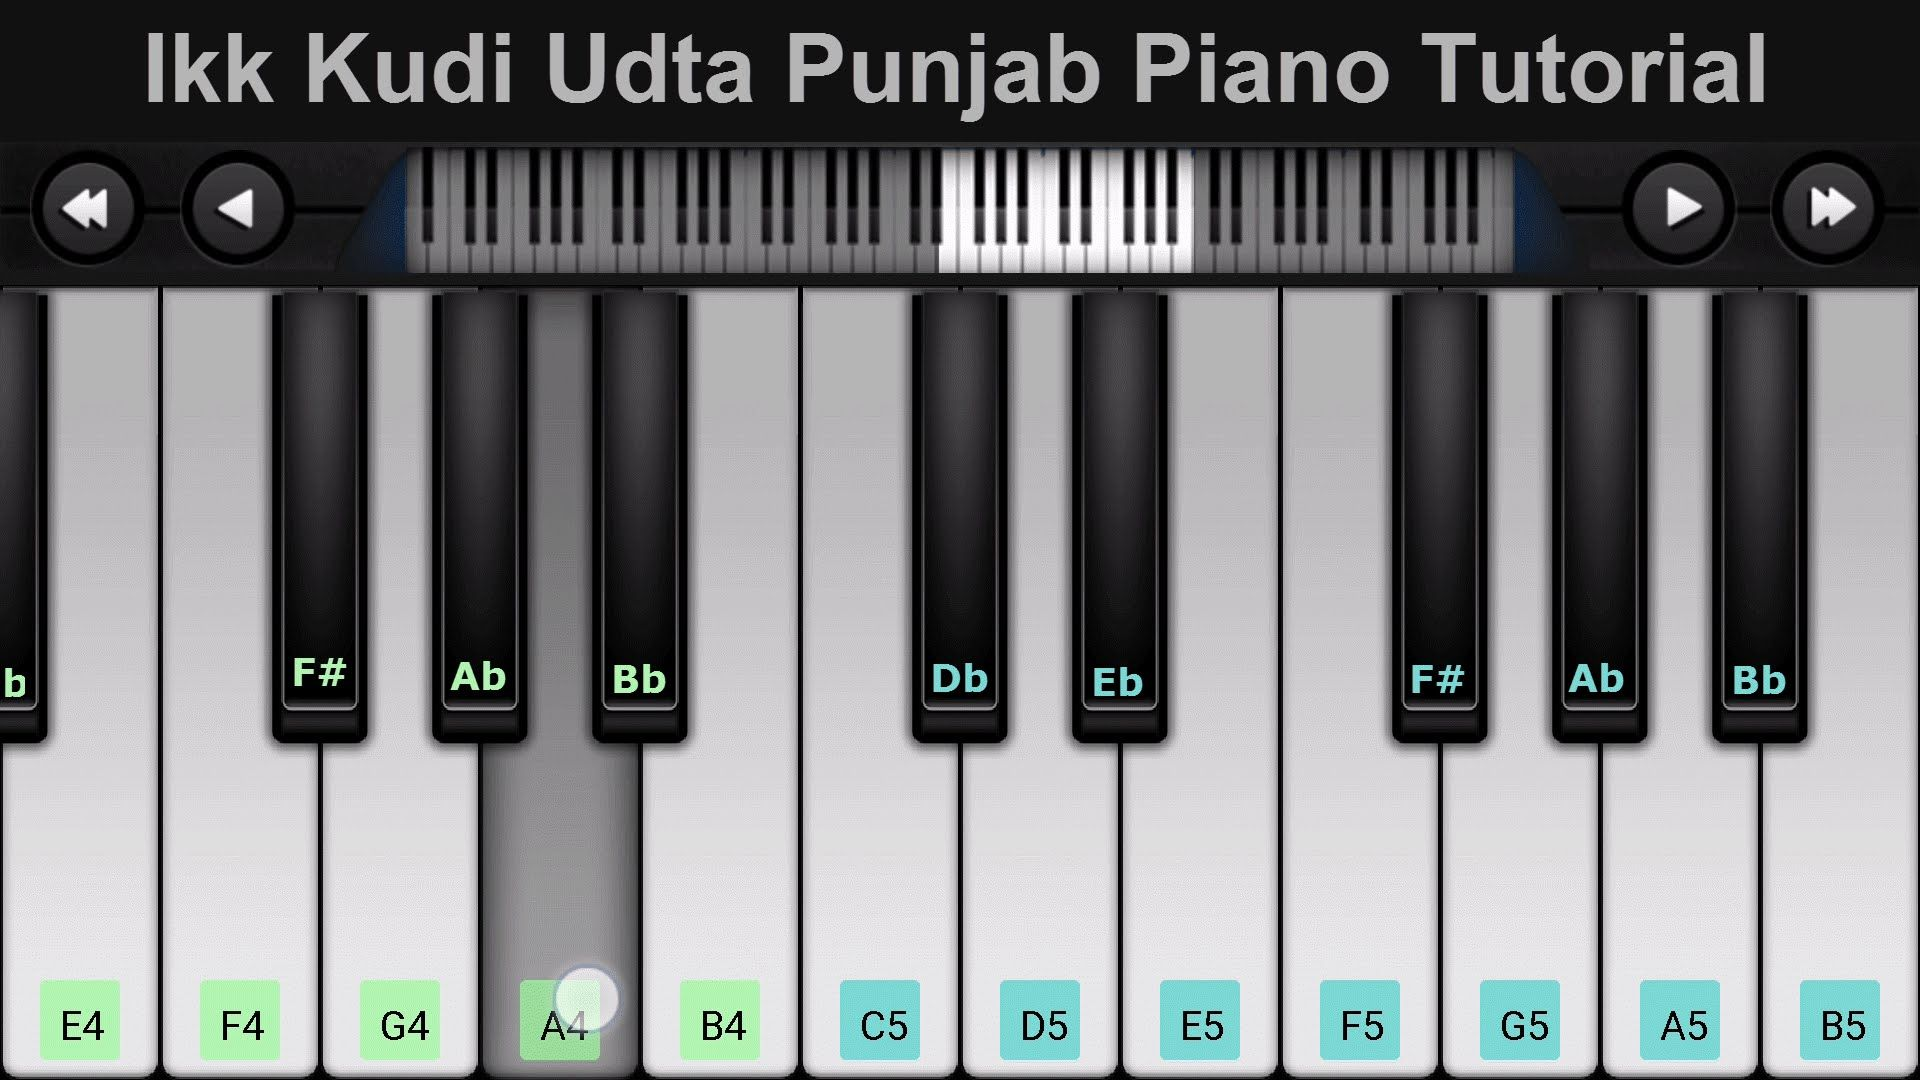 Ikk Kudi Udta Punjab Piano Tutorial With Piano Notes How